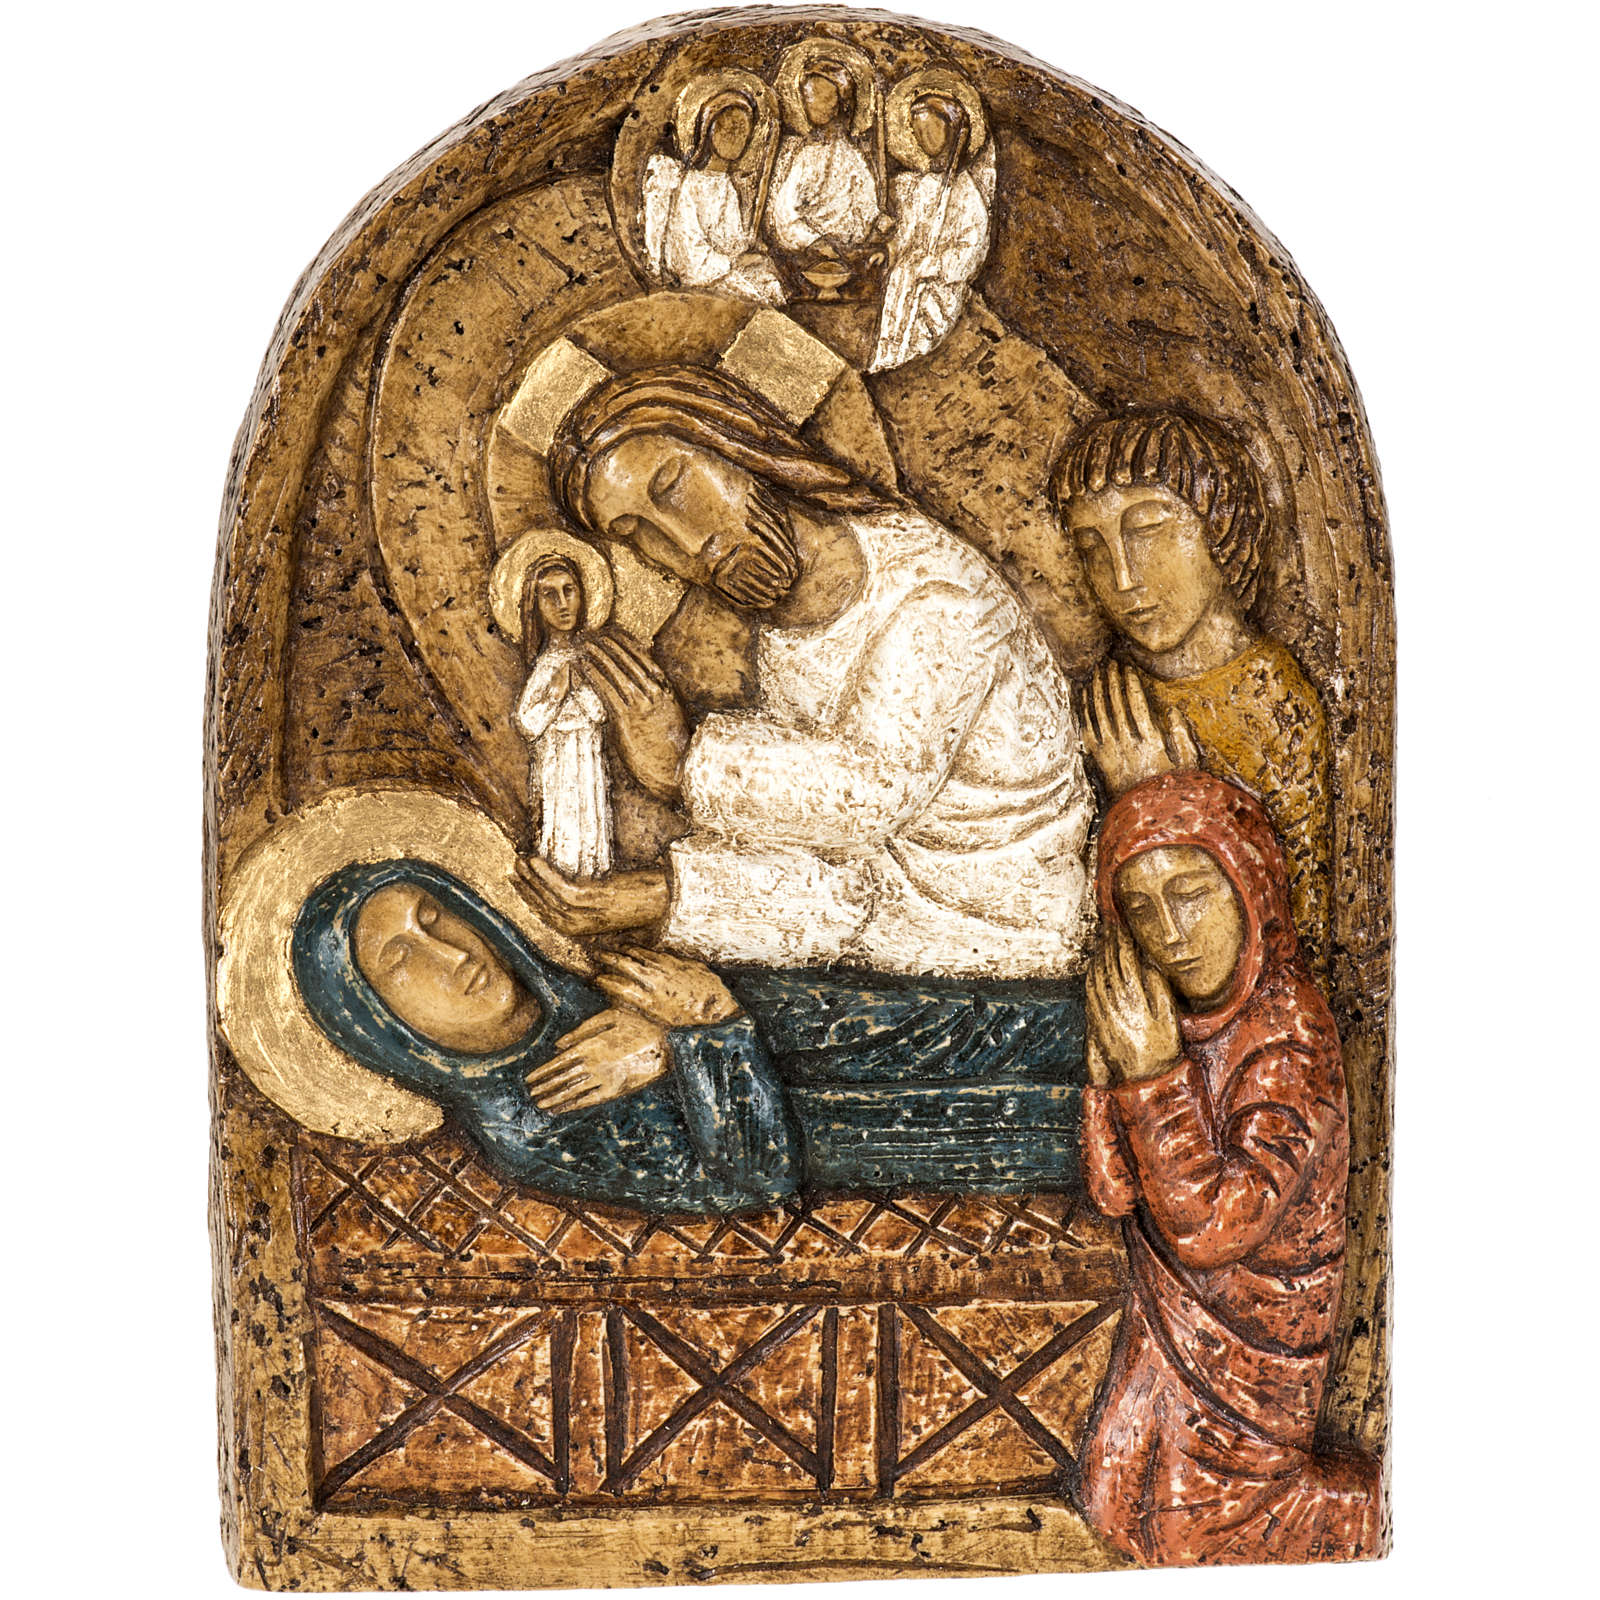 Assunzione bassorilievo pietra Bethléem 4